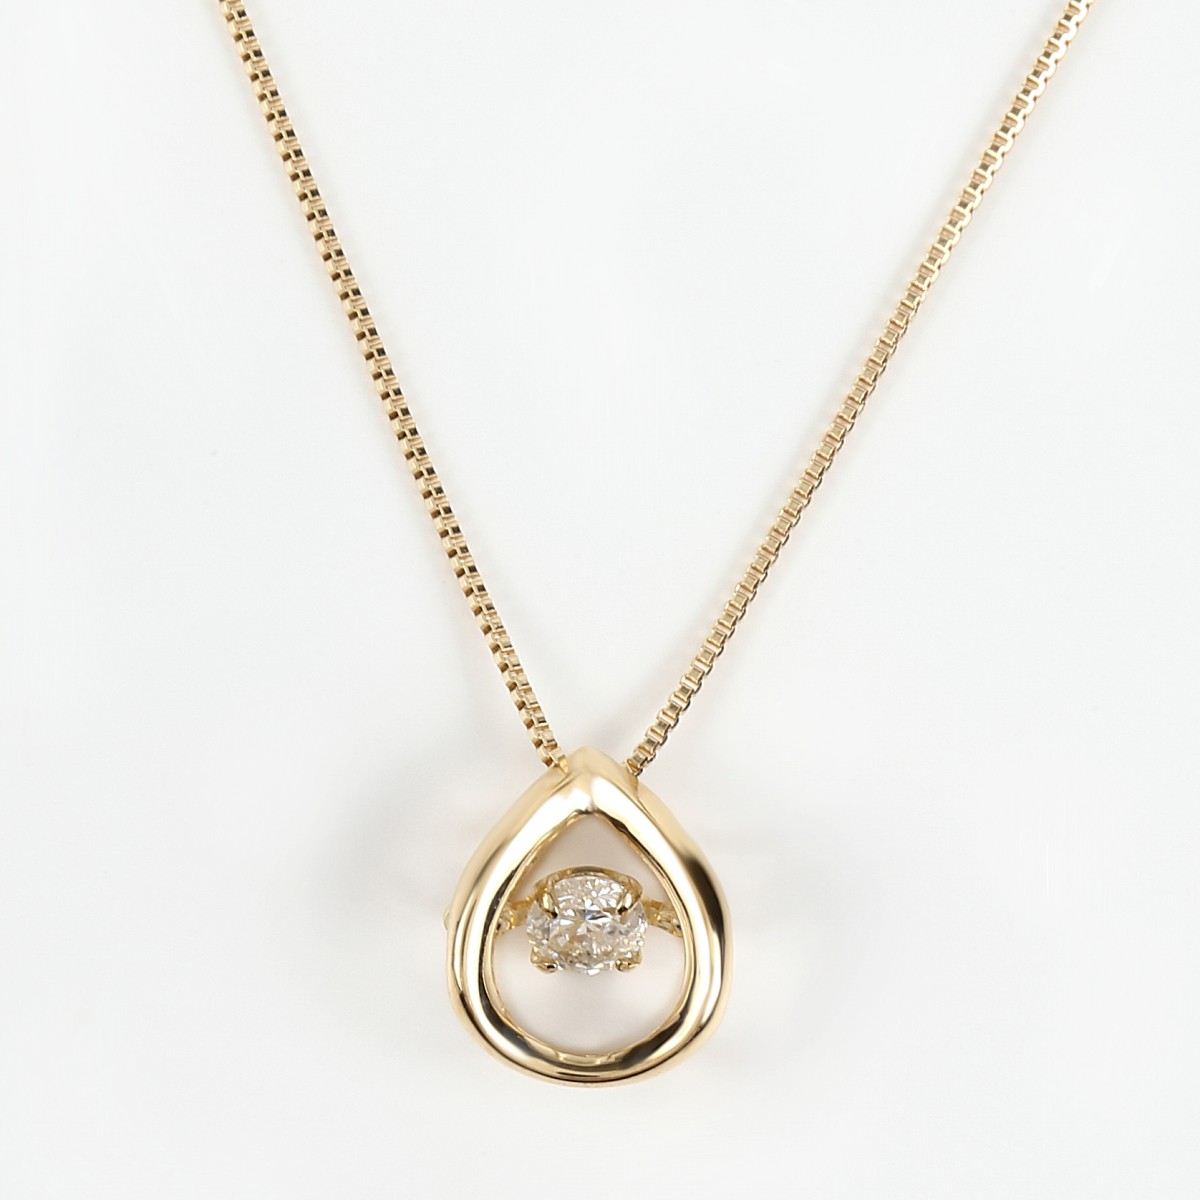 K18 揺れる ダンシングストーン ダイヤモンドネックレス ダイヤ 0.08ct (K18 0.5mm 40cm ベネチアンチェーン)